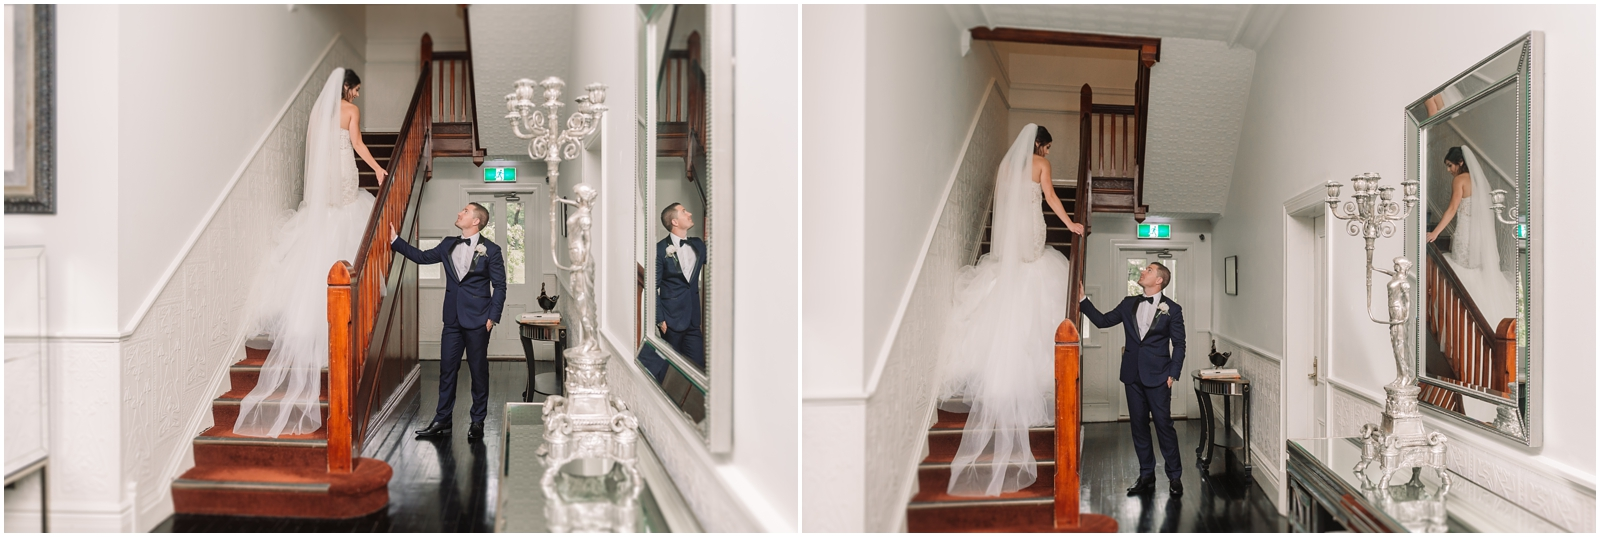 Circa1876 Wedding Popcorn Photography_0045.jpg